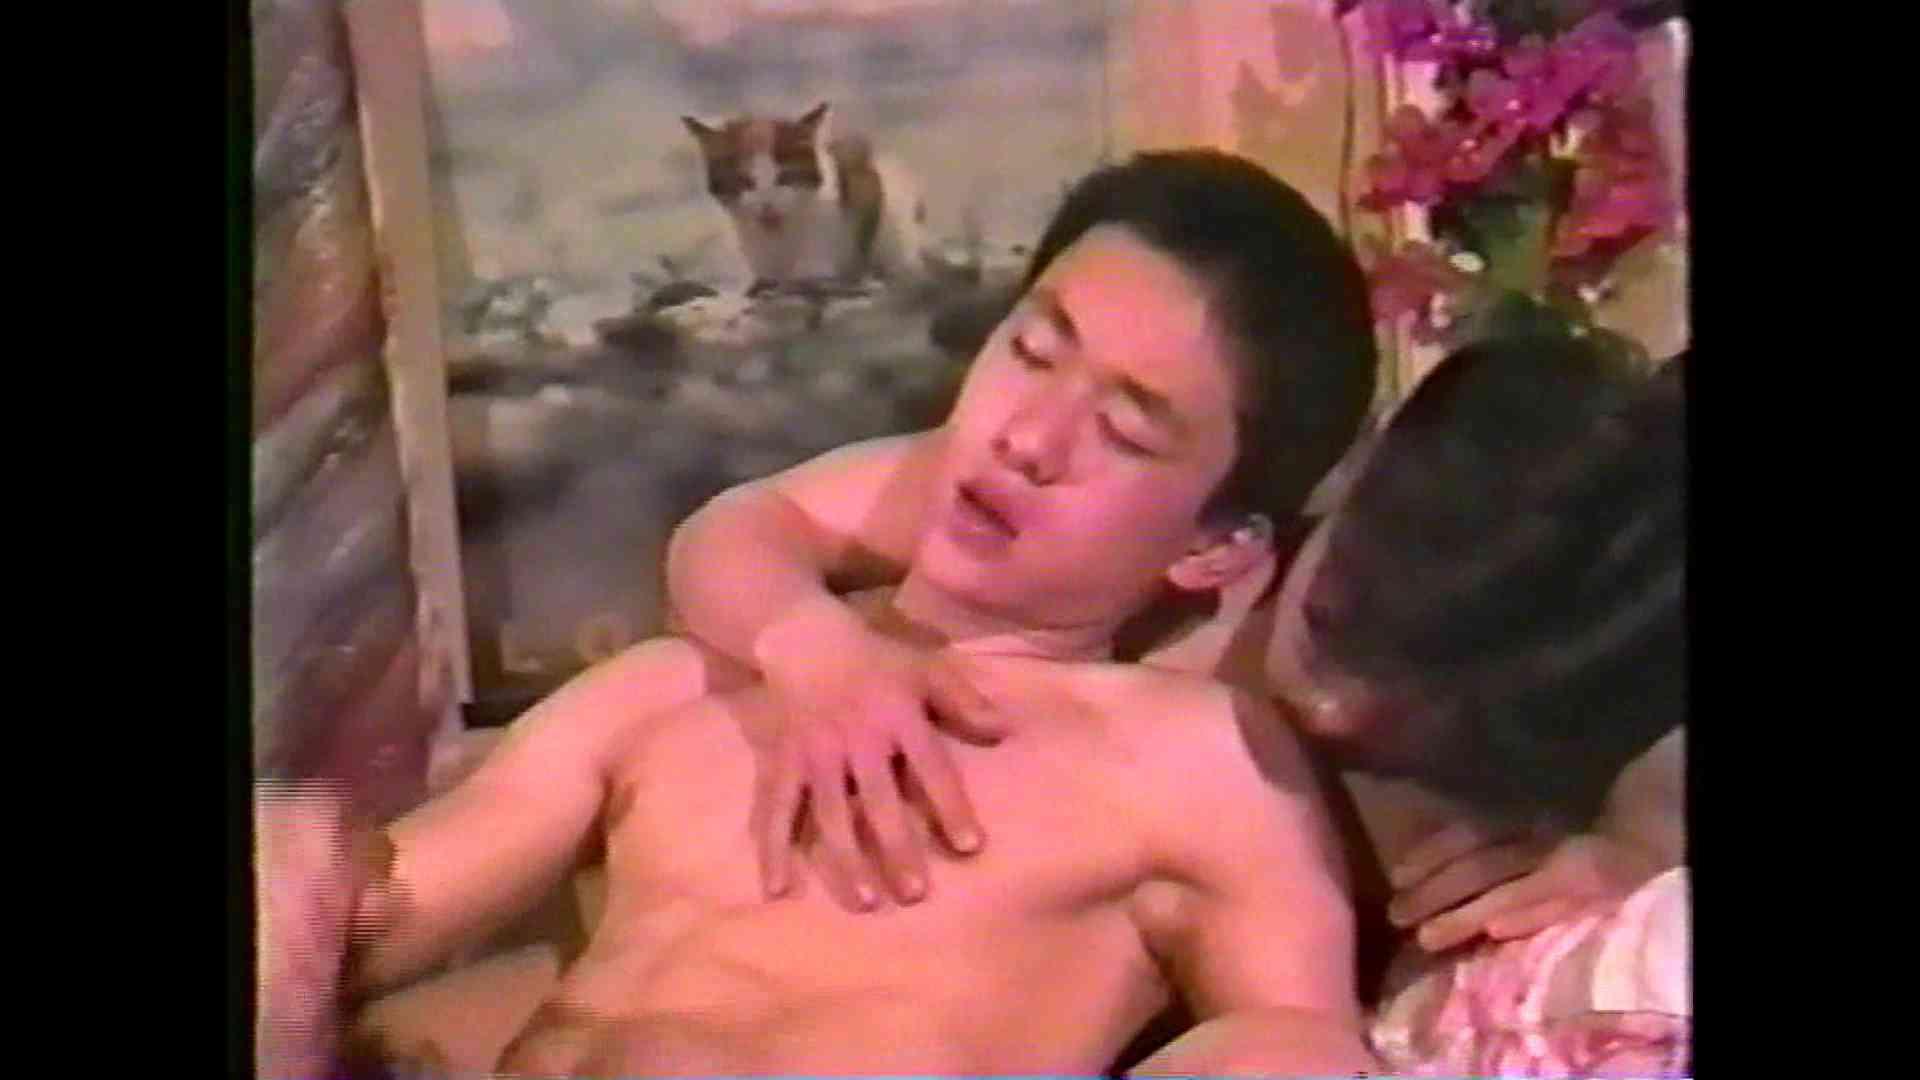 MADOKAさんのズリネタコレクションVol.2-2 入浴・シャワー | フェチ色々  101pic 84